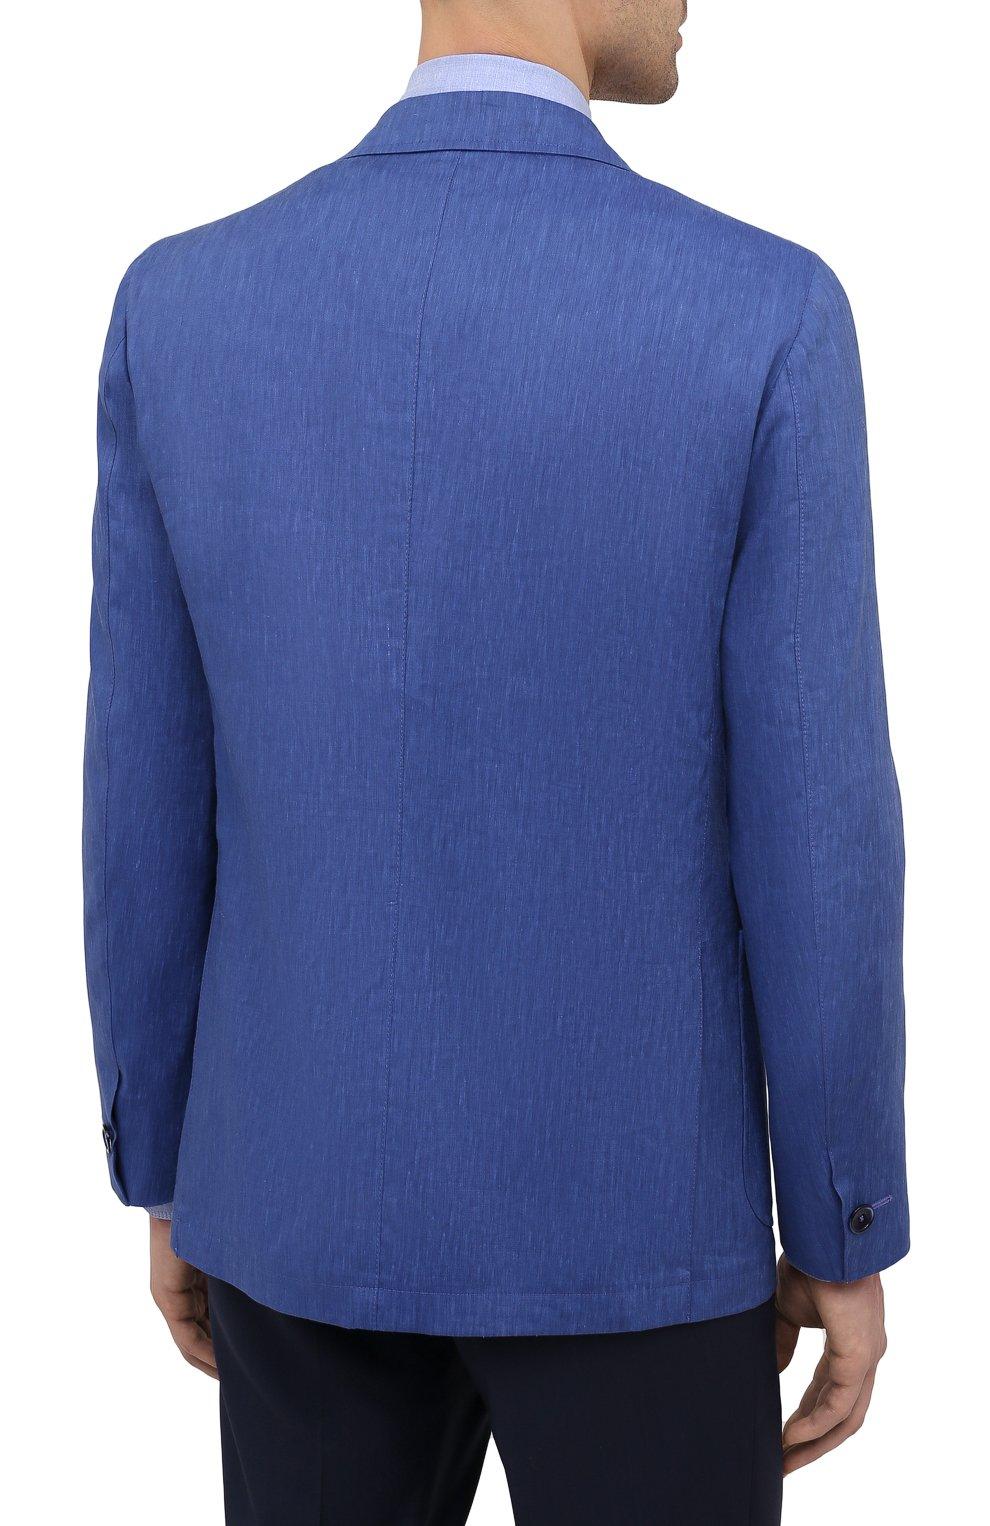 Мужской пиджак из шерсти и льна ZILLI темно-синего цвета, арт. MNV-ECKX-2-E6031/0001 | Фото 4